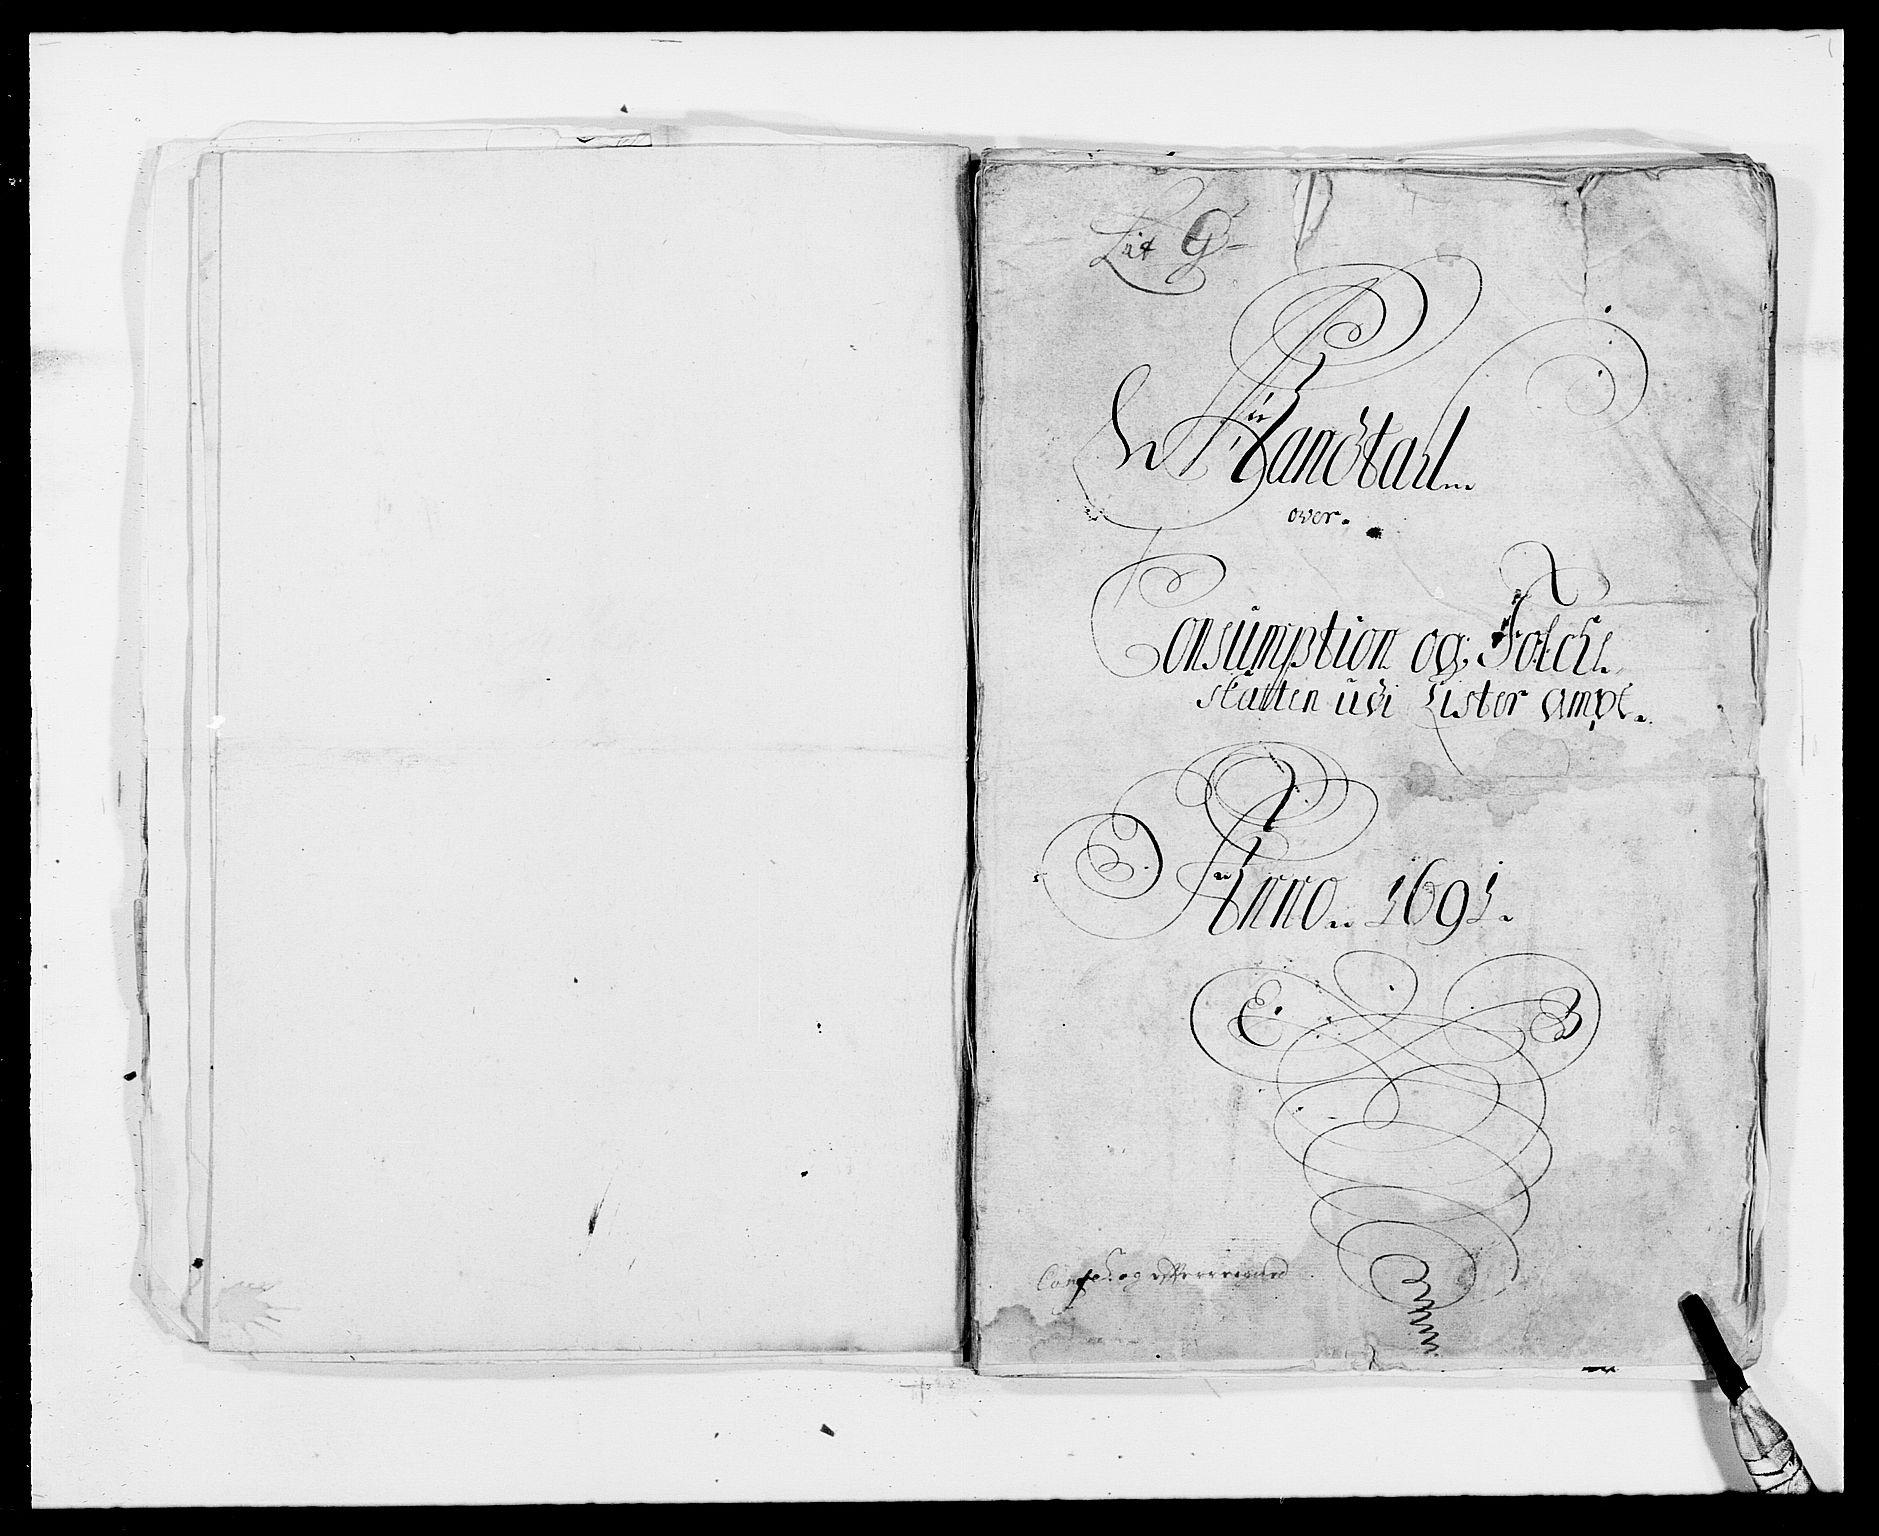 RA, Rentekammeret inntil 1814, Reviderte regnskaper, Fogderegnskap, R41/L2536: Fogderegnskap Lista, 1690-1693, s. 161